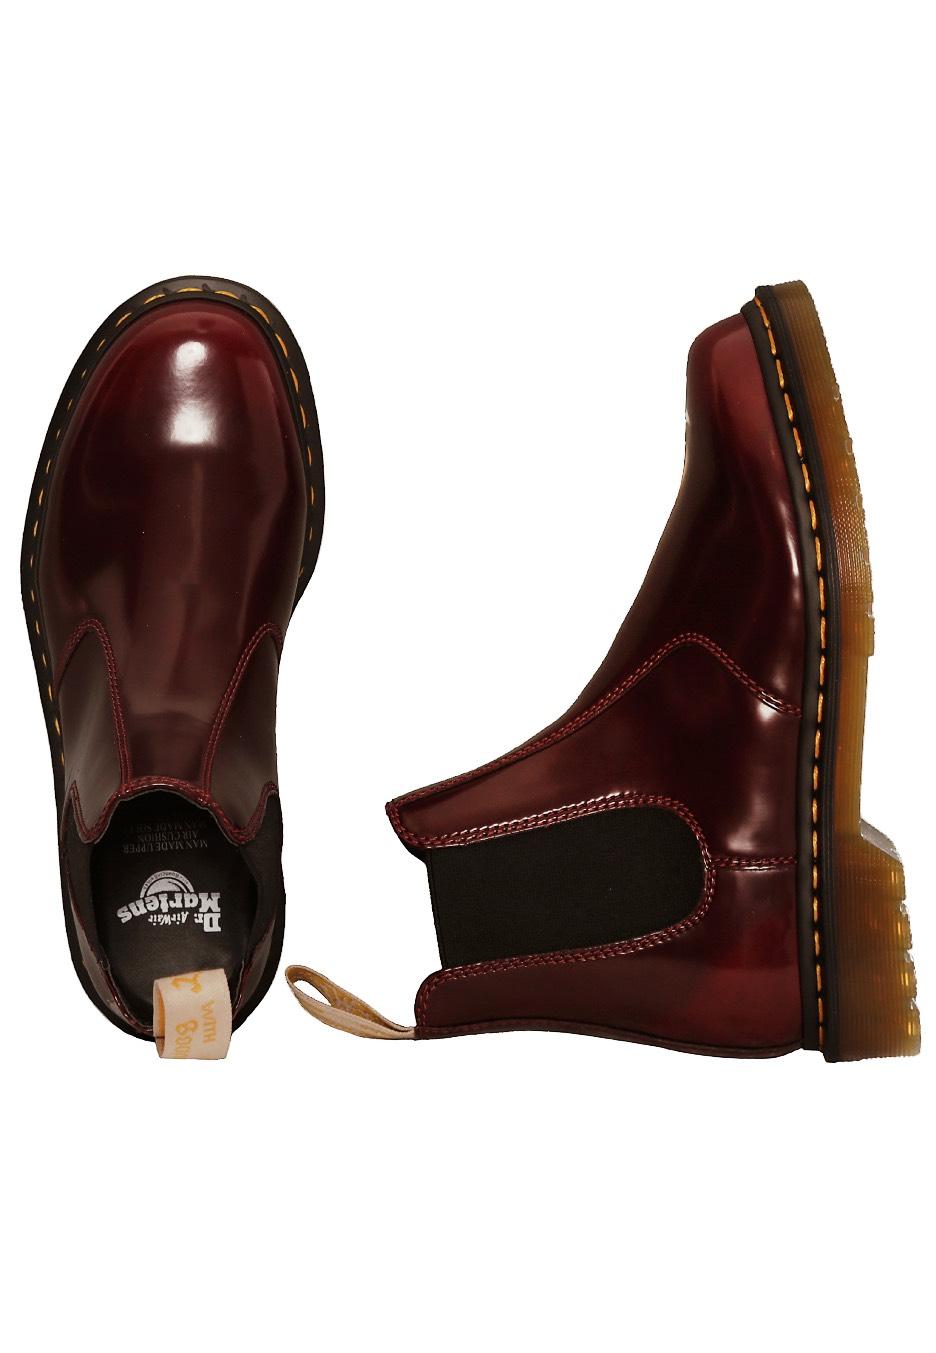 Neueste Mode amazon günstig kaufen Dr. Martens - Vegan 2976 Chelsea Boots Cherry Red Oxford Rub Off - Girl  Shoes